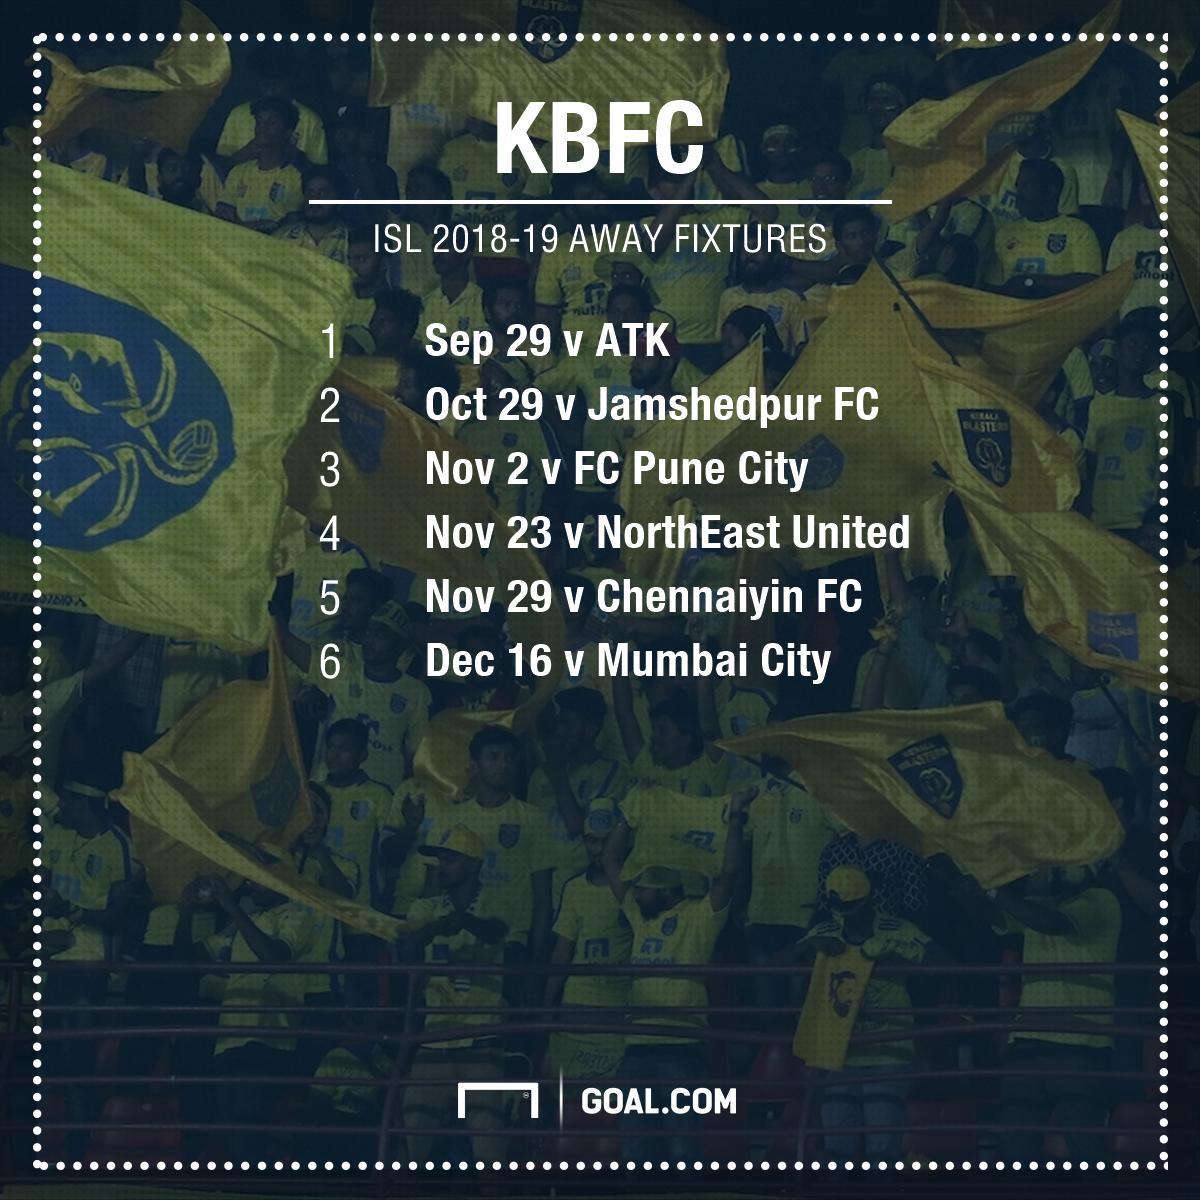 ISL 2018-19 KBFC Away